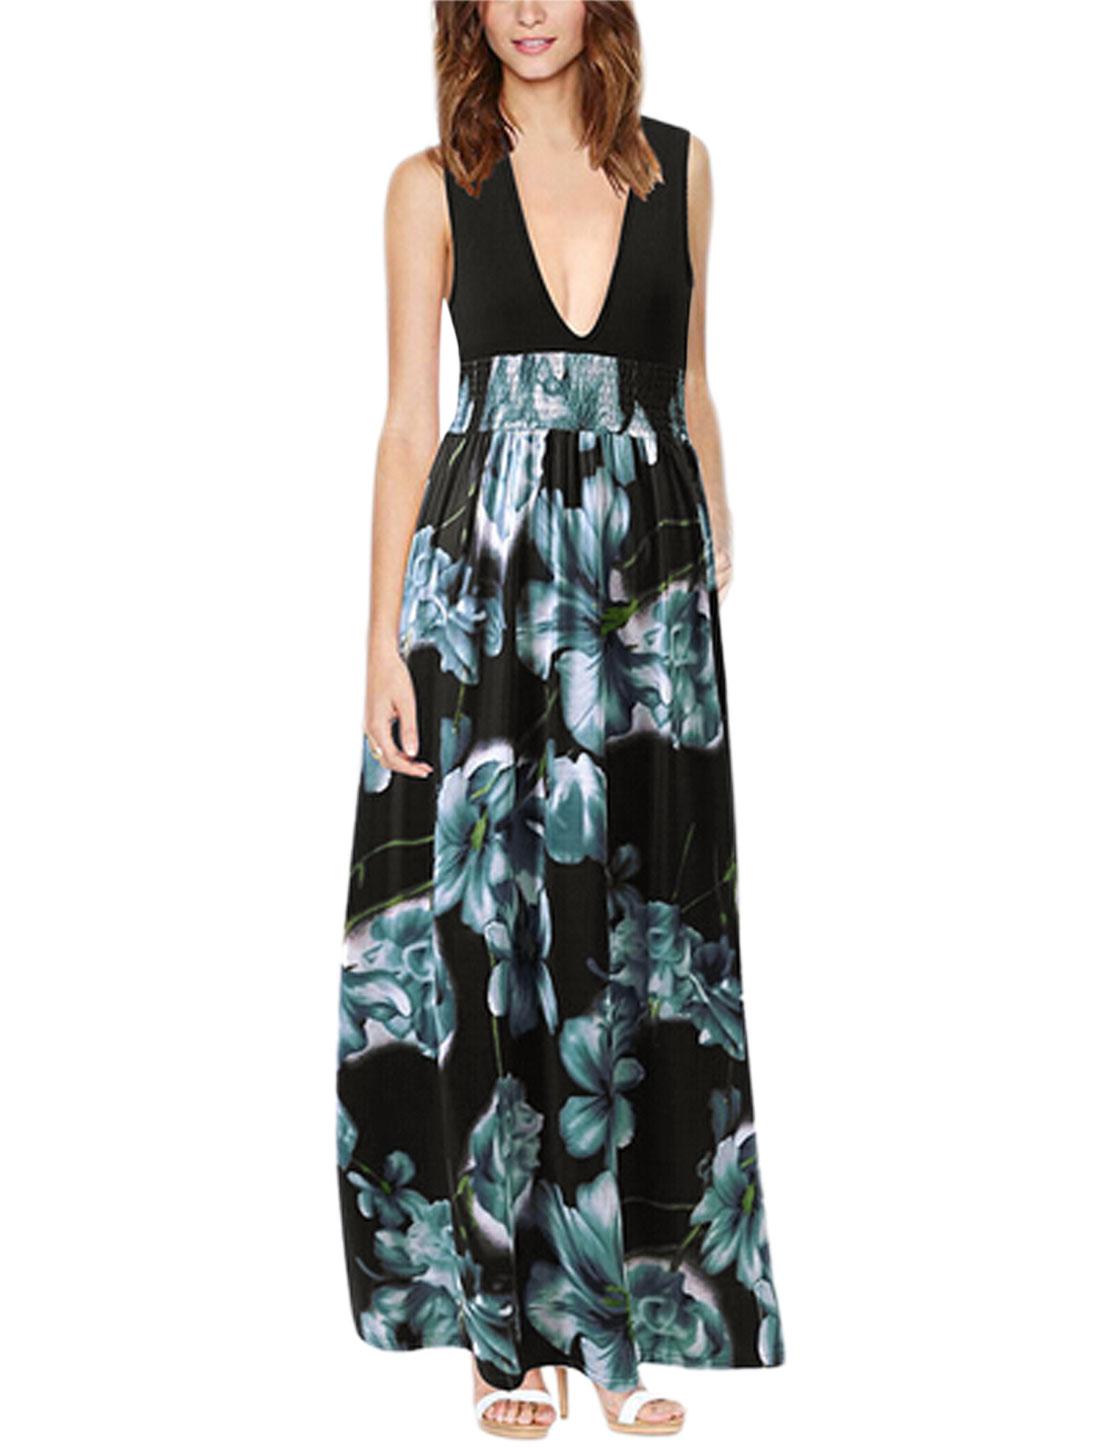 Women Floral Prints Smocked Waist Maxi Dress Light Cool Gray Black M